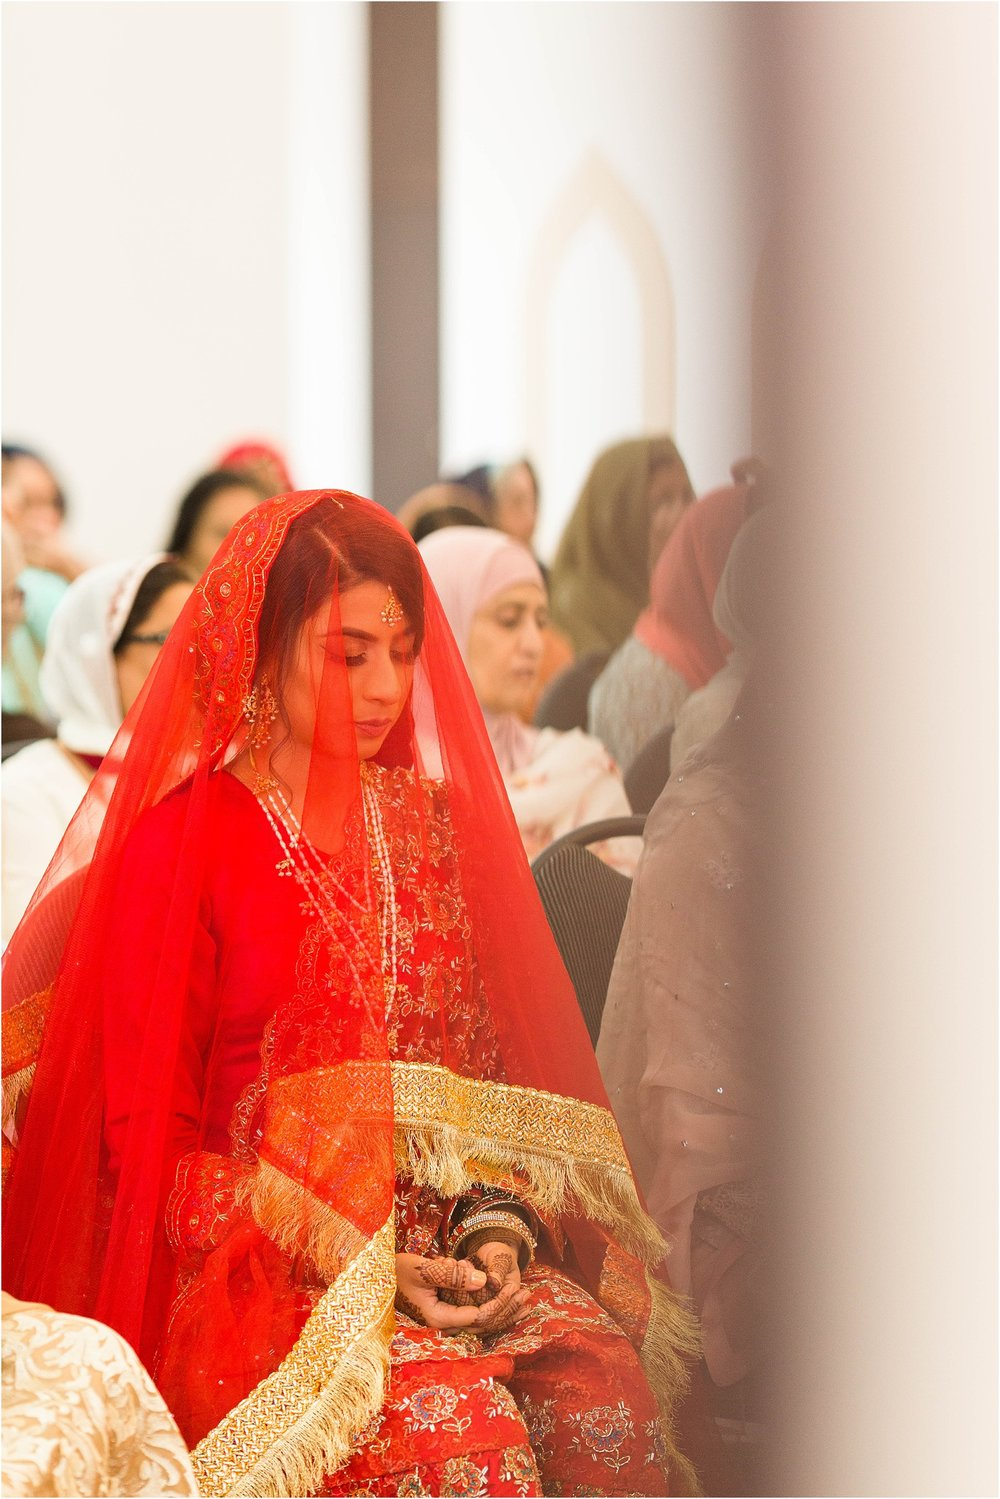 Jame-Masjid-Coopers-Mosque-Kariya-Park-Cherry-Blossoms-Wedding-Toronto-Mississauga-Brampton-Scarborough-GTA-Pakistani-Indian-Wedding-Engagement-Photographer-Photography_0027.jpg